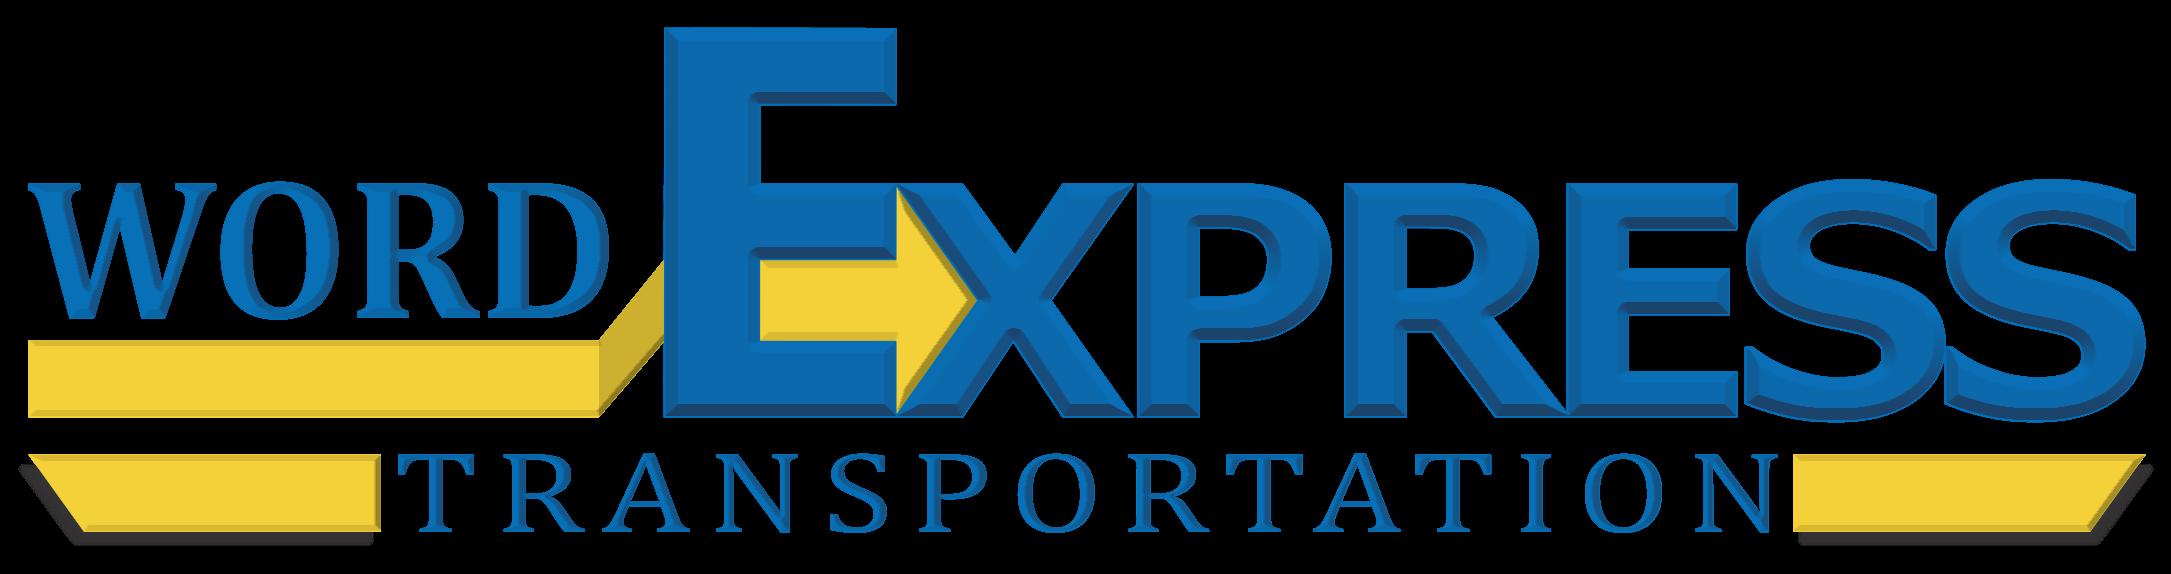 Word Express Transportation